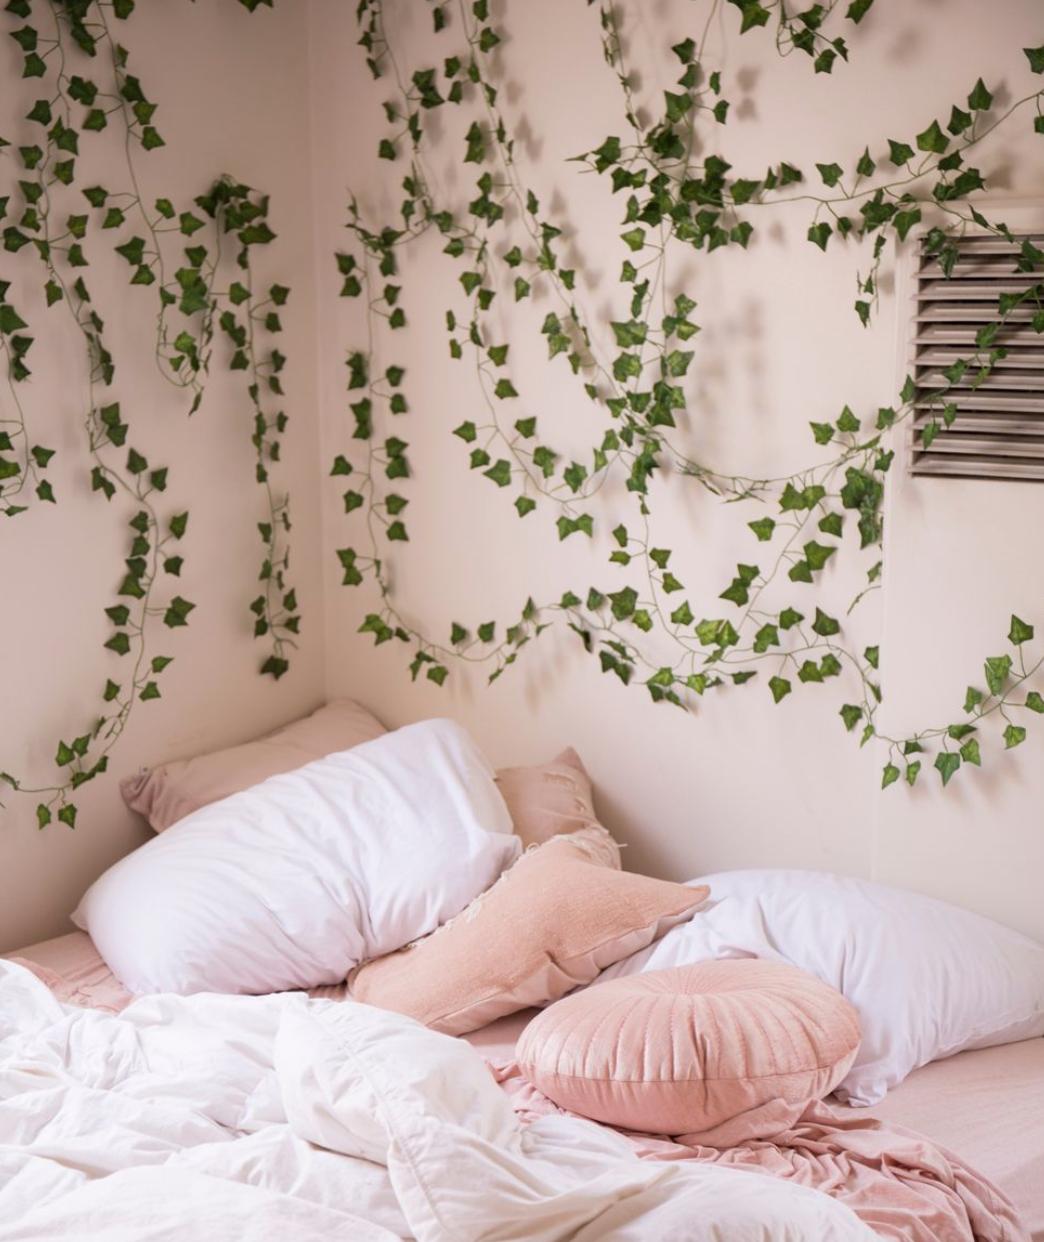 Decorative Vines Set In 2021 Redecorate Bedroom Bedroom Decor Inspiration Room Inspiration Bedroom